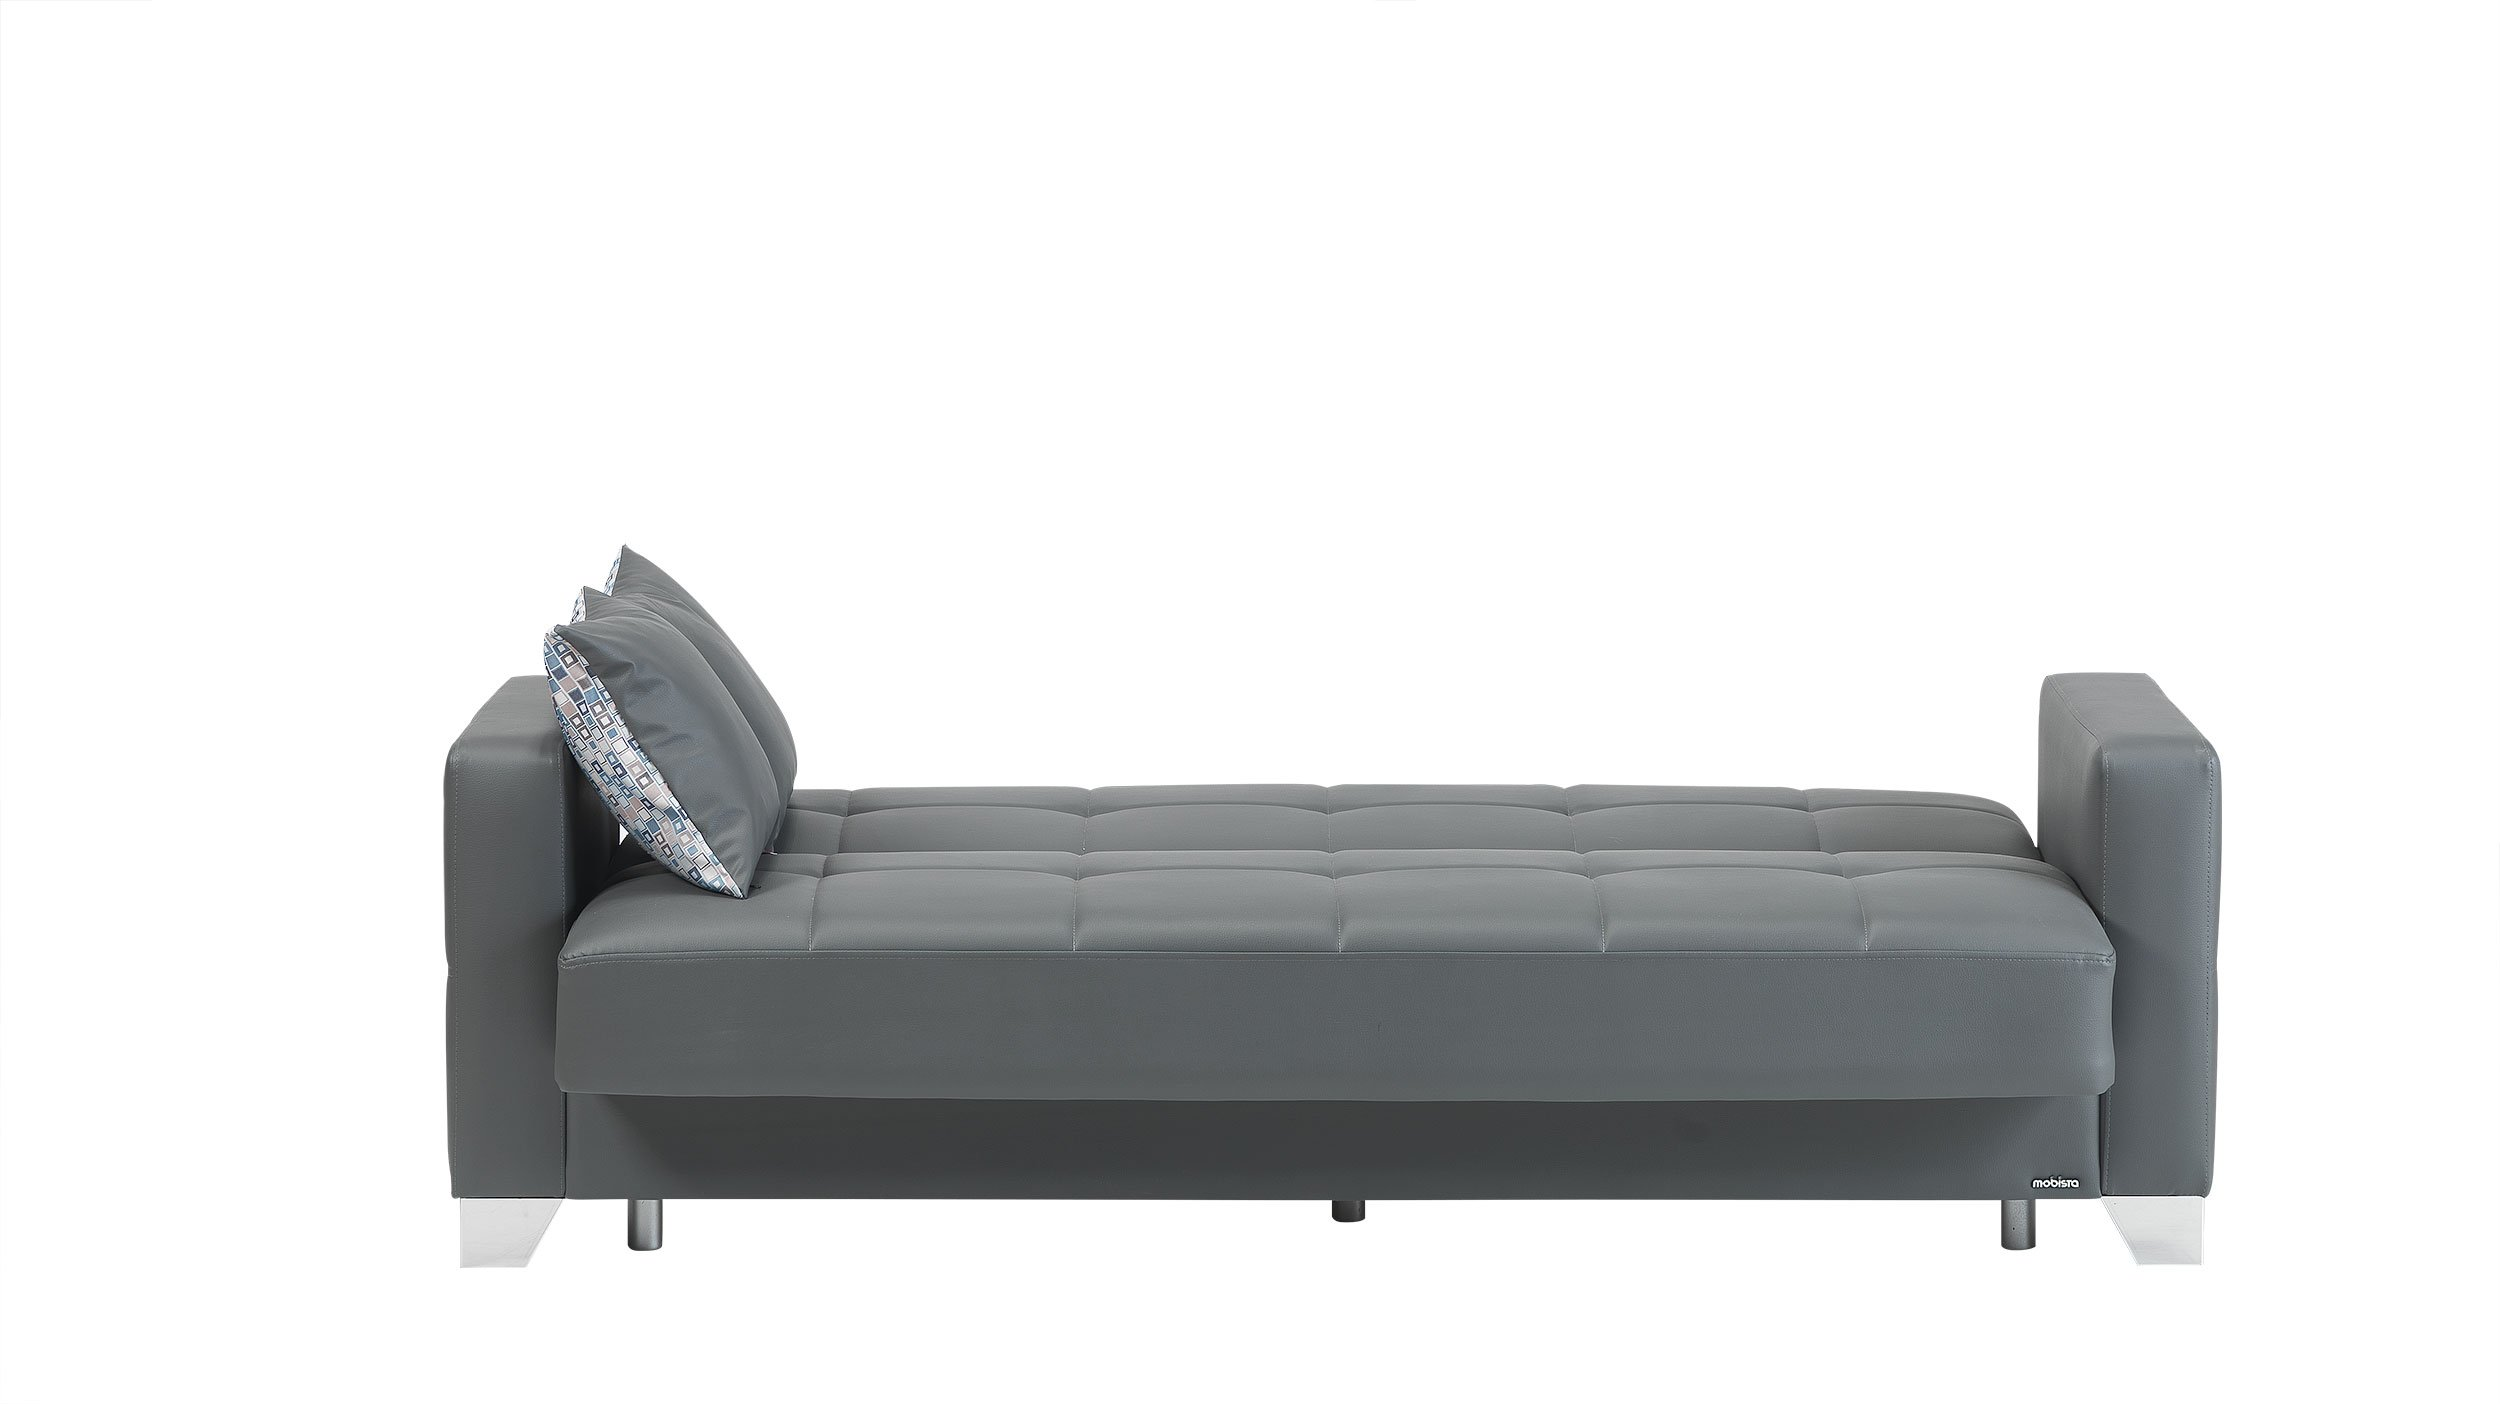 Viva Italia Prestige Dark Gray Leatherette Sofa Bed by Mobista